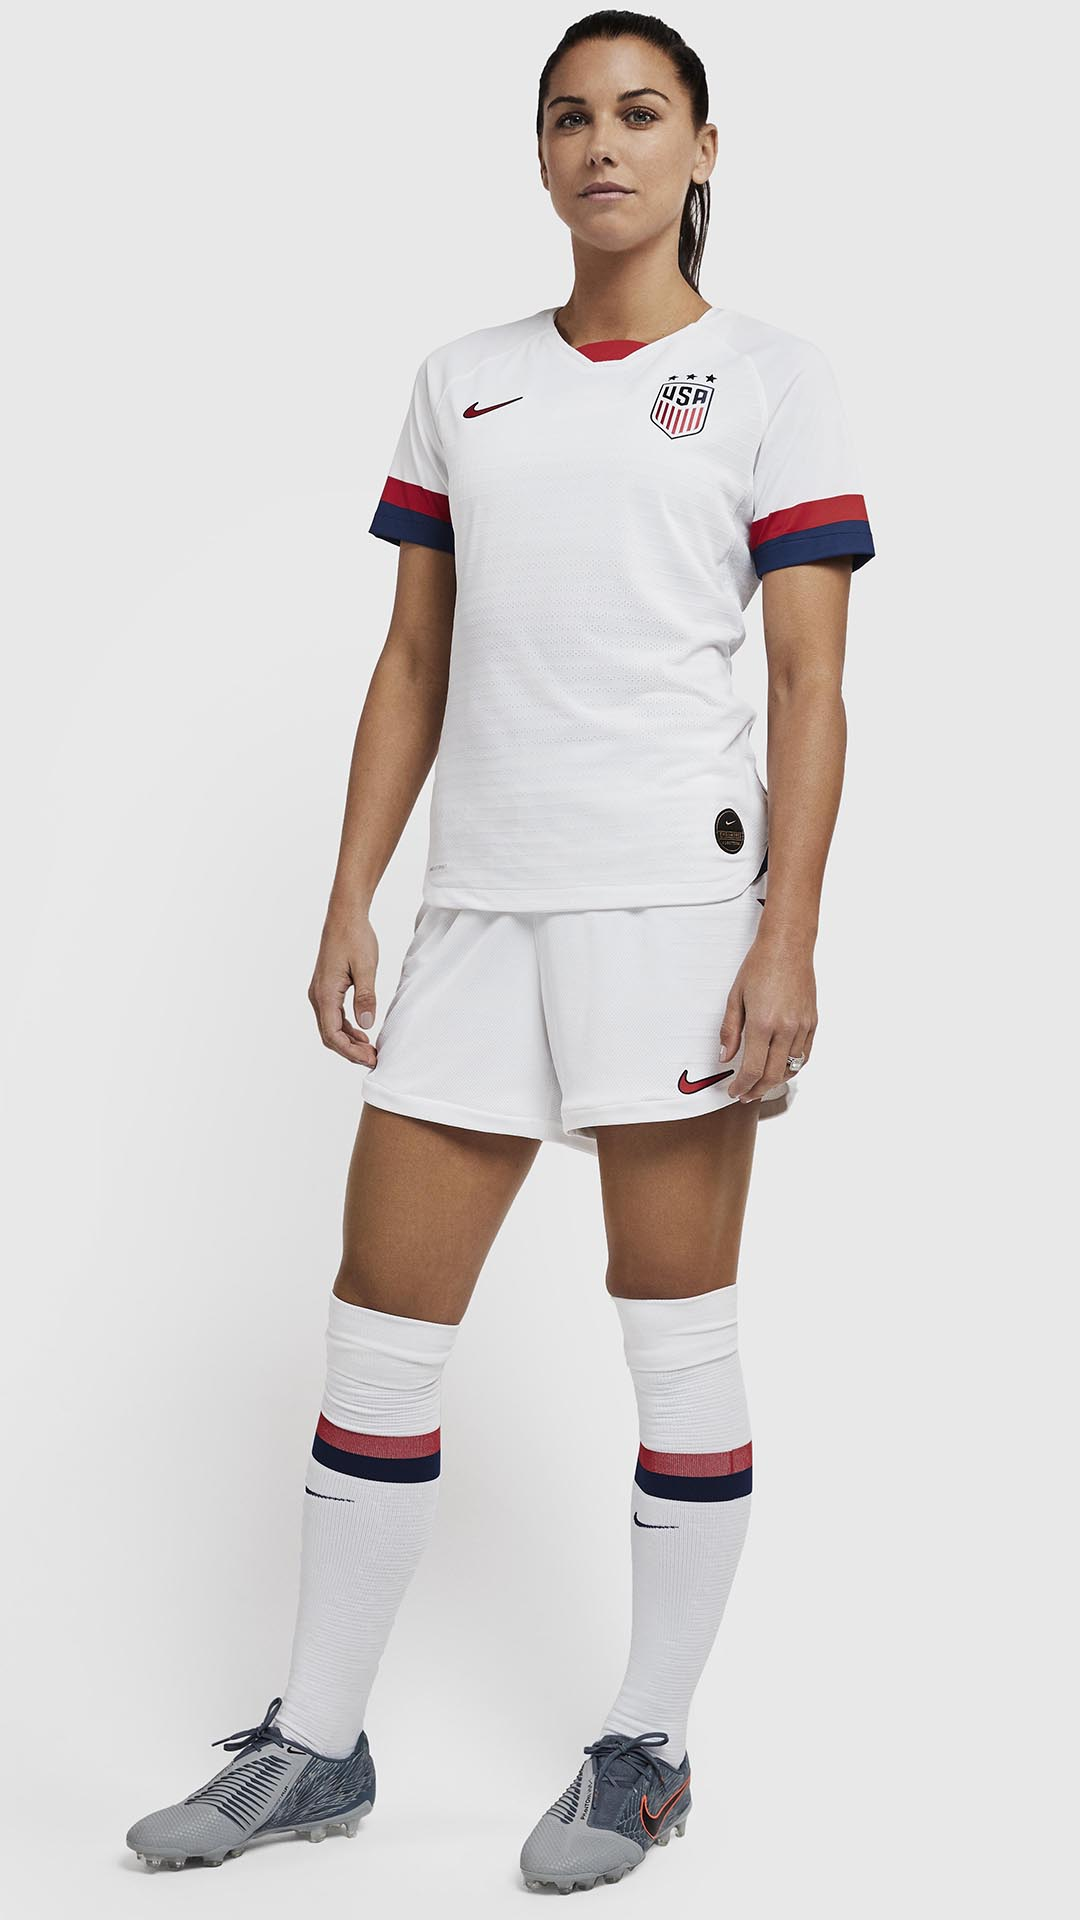 maillot-domicile-usa-etats-unis-coupe-du-monde-feminine-2019-nike